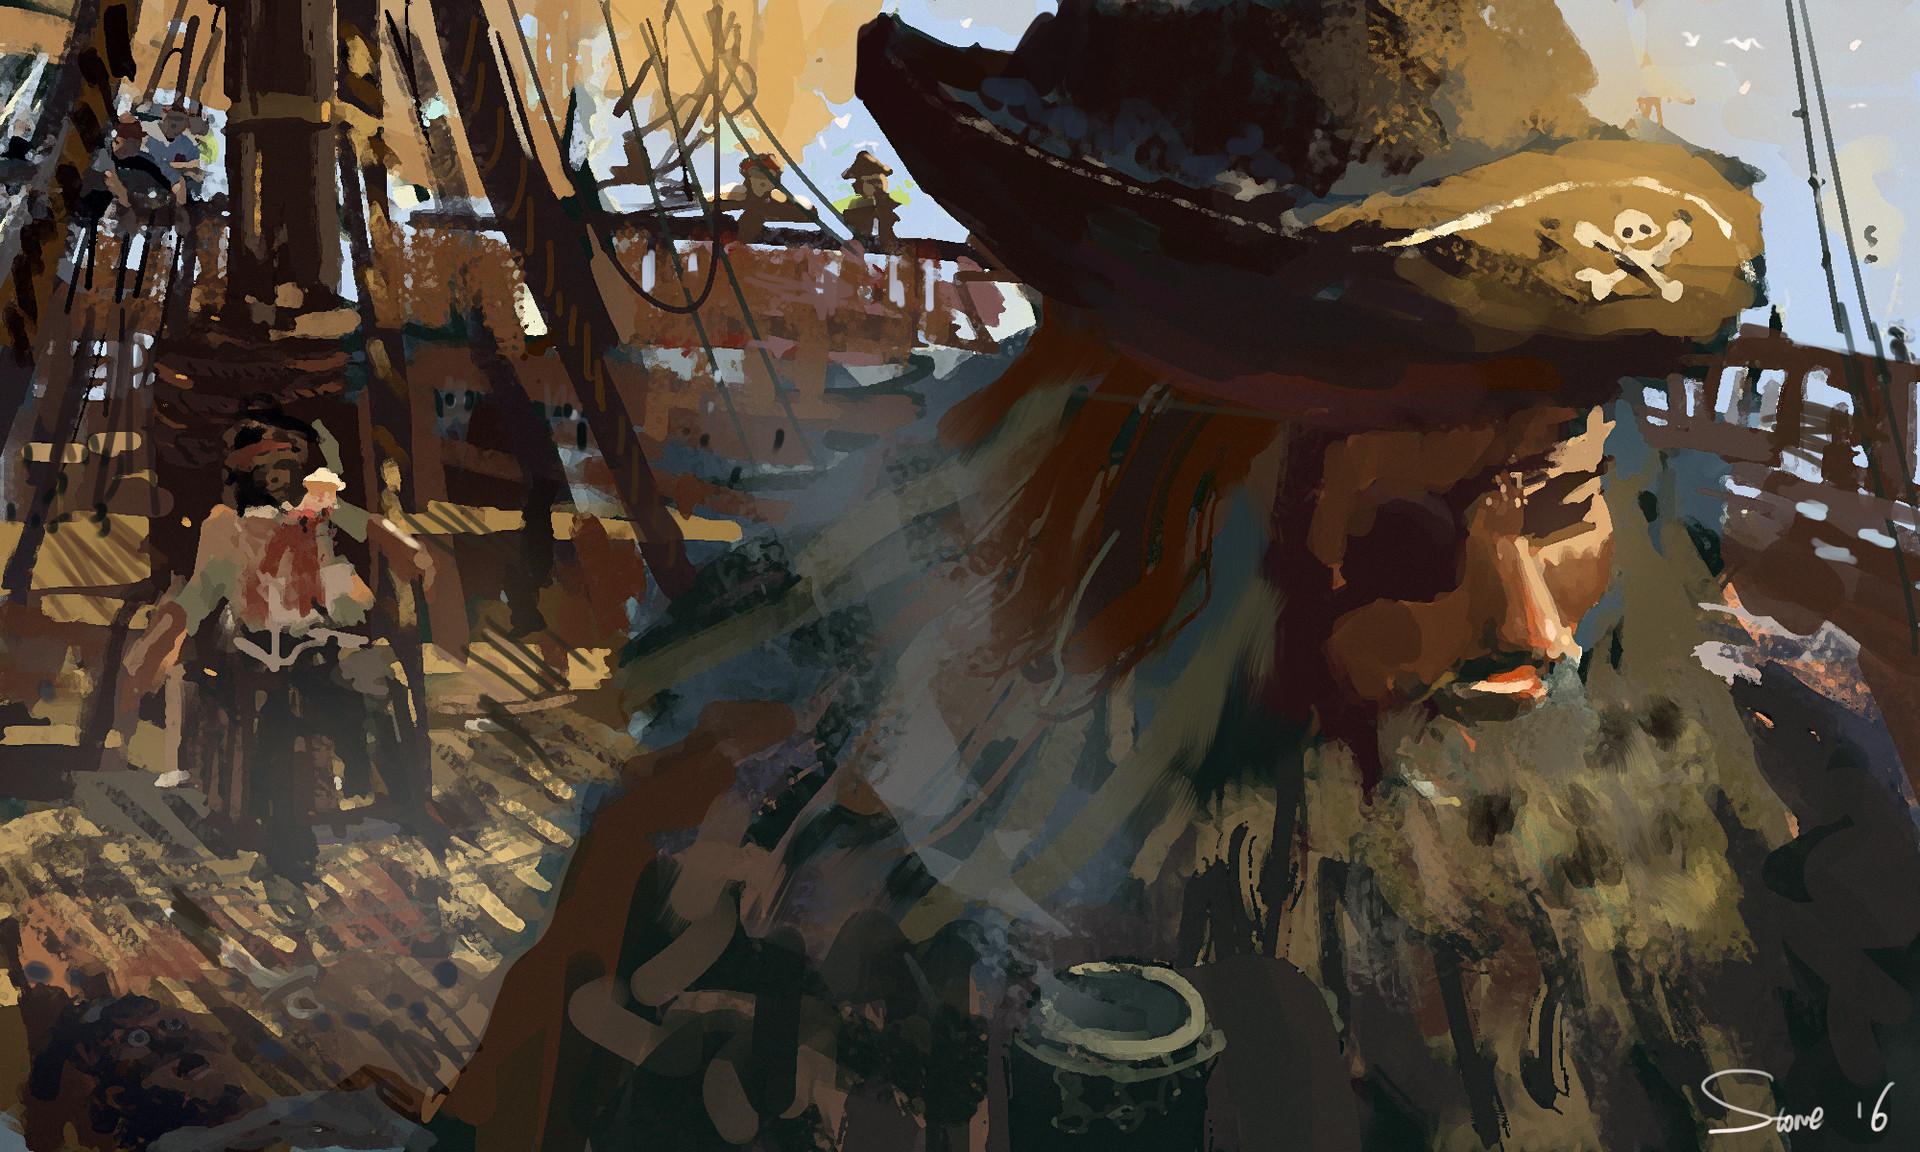 John Stone - He's a pirate